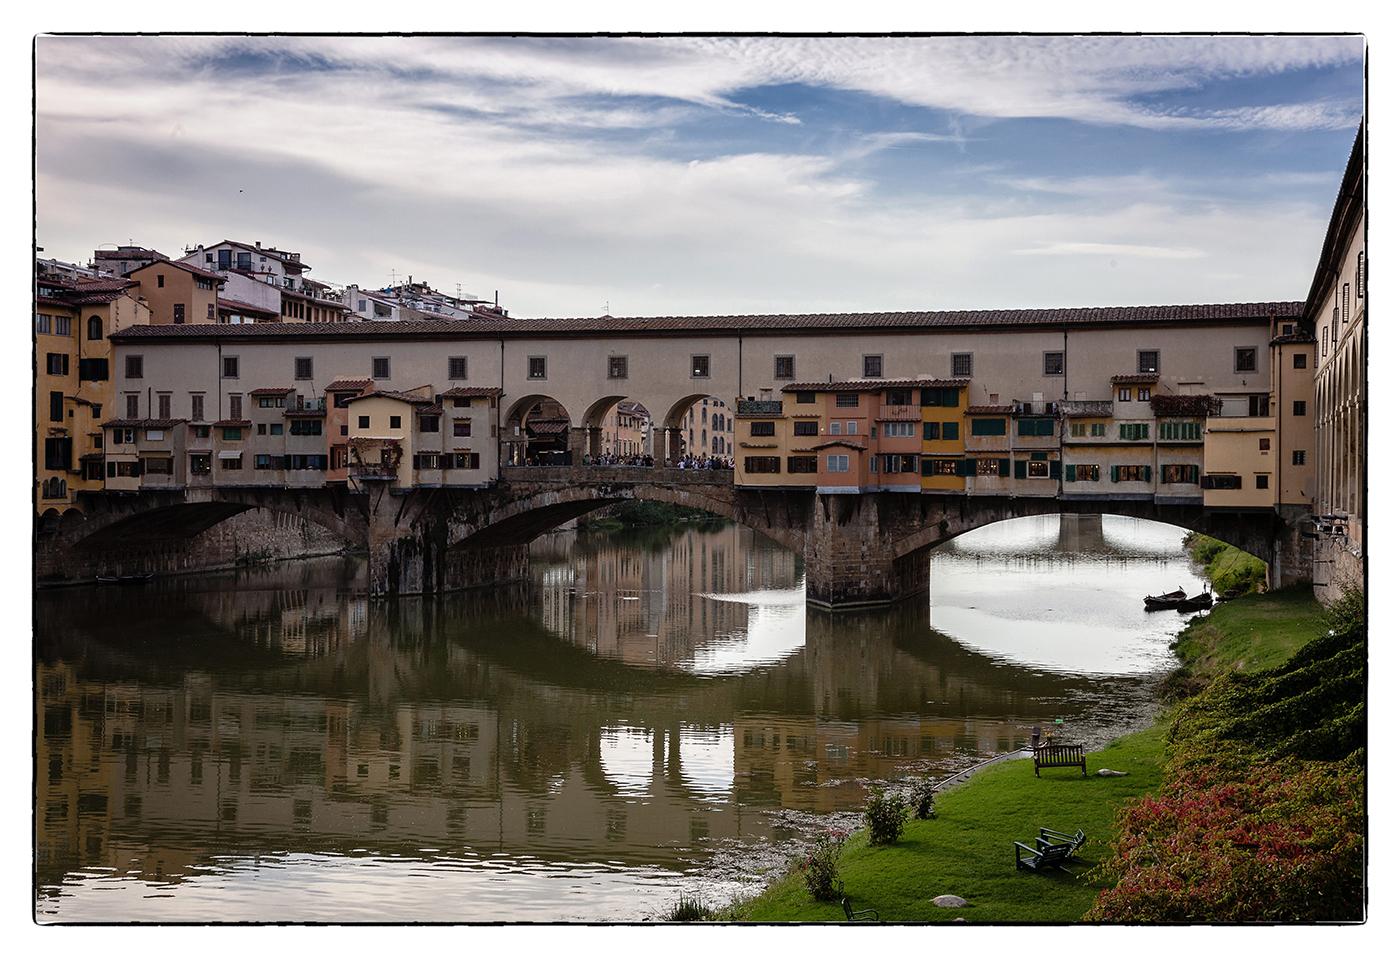 30/09/2014 -1 (Florenz)